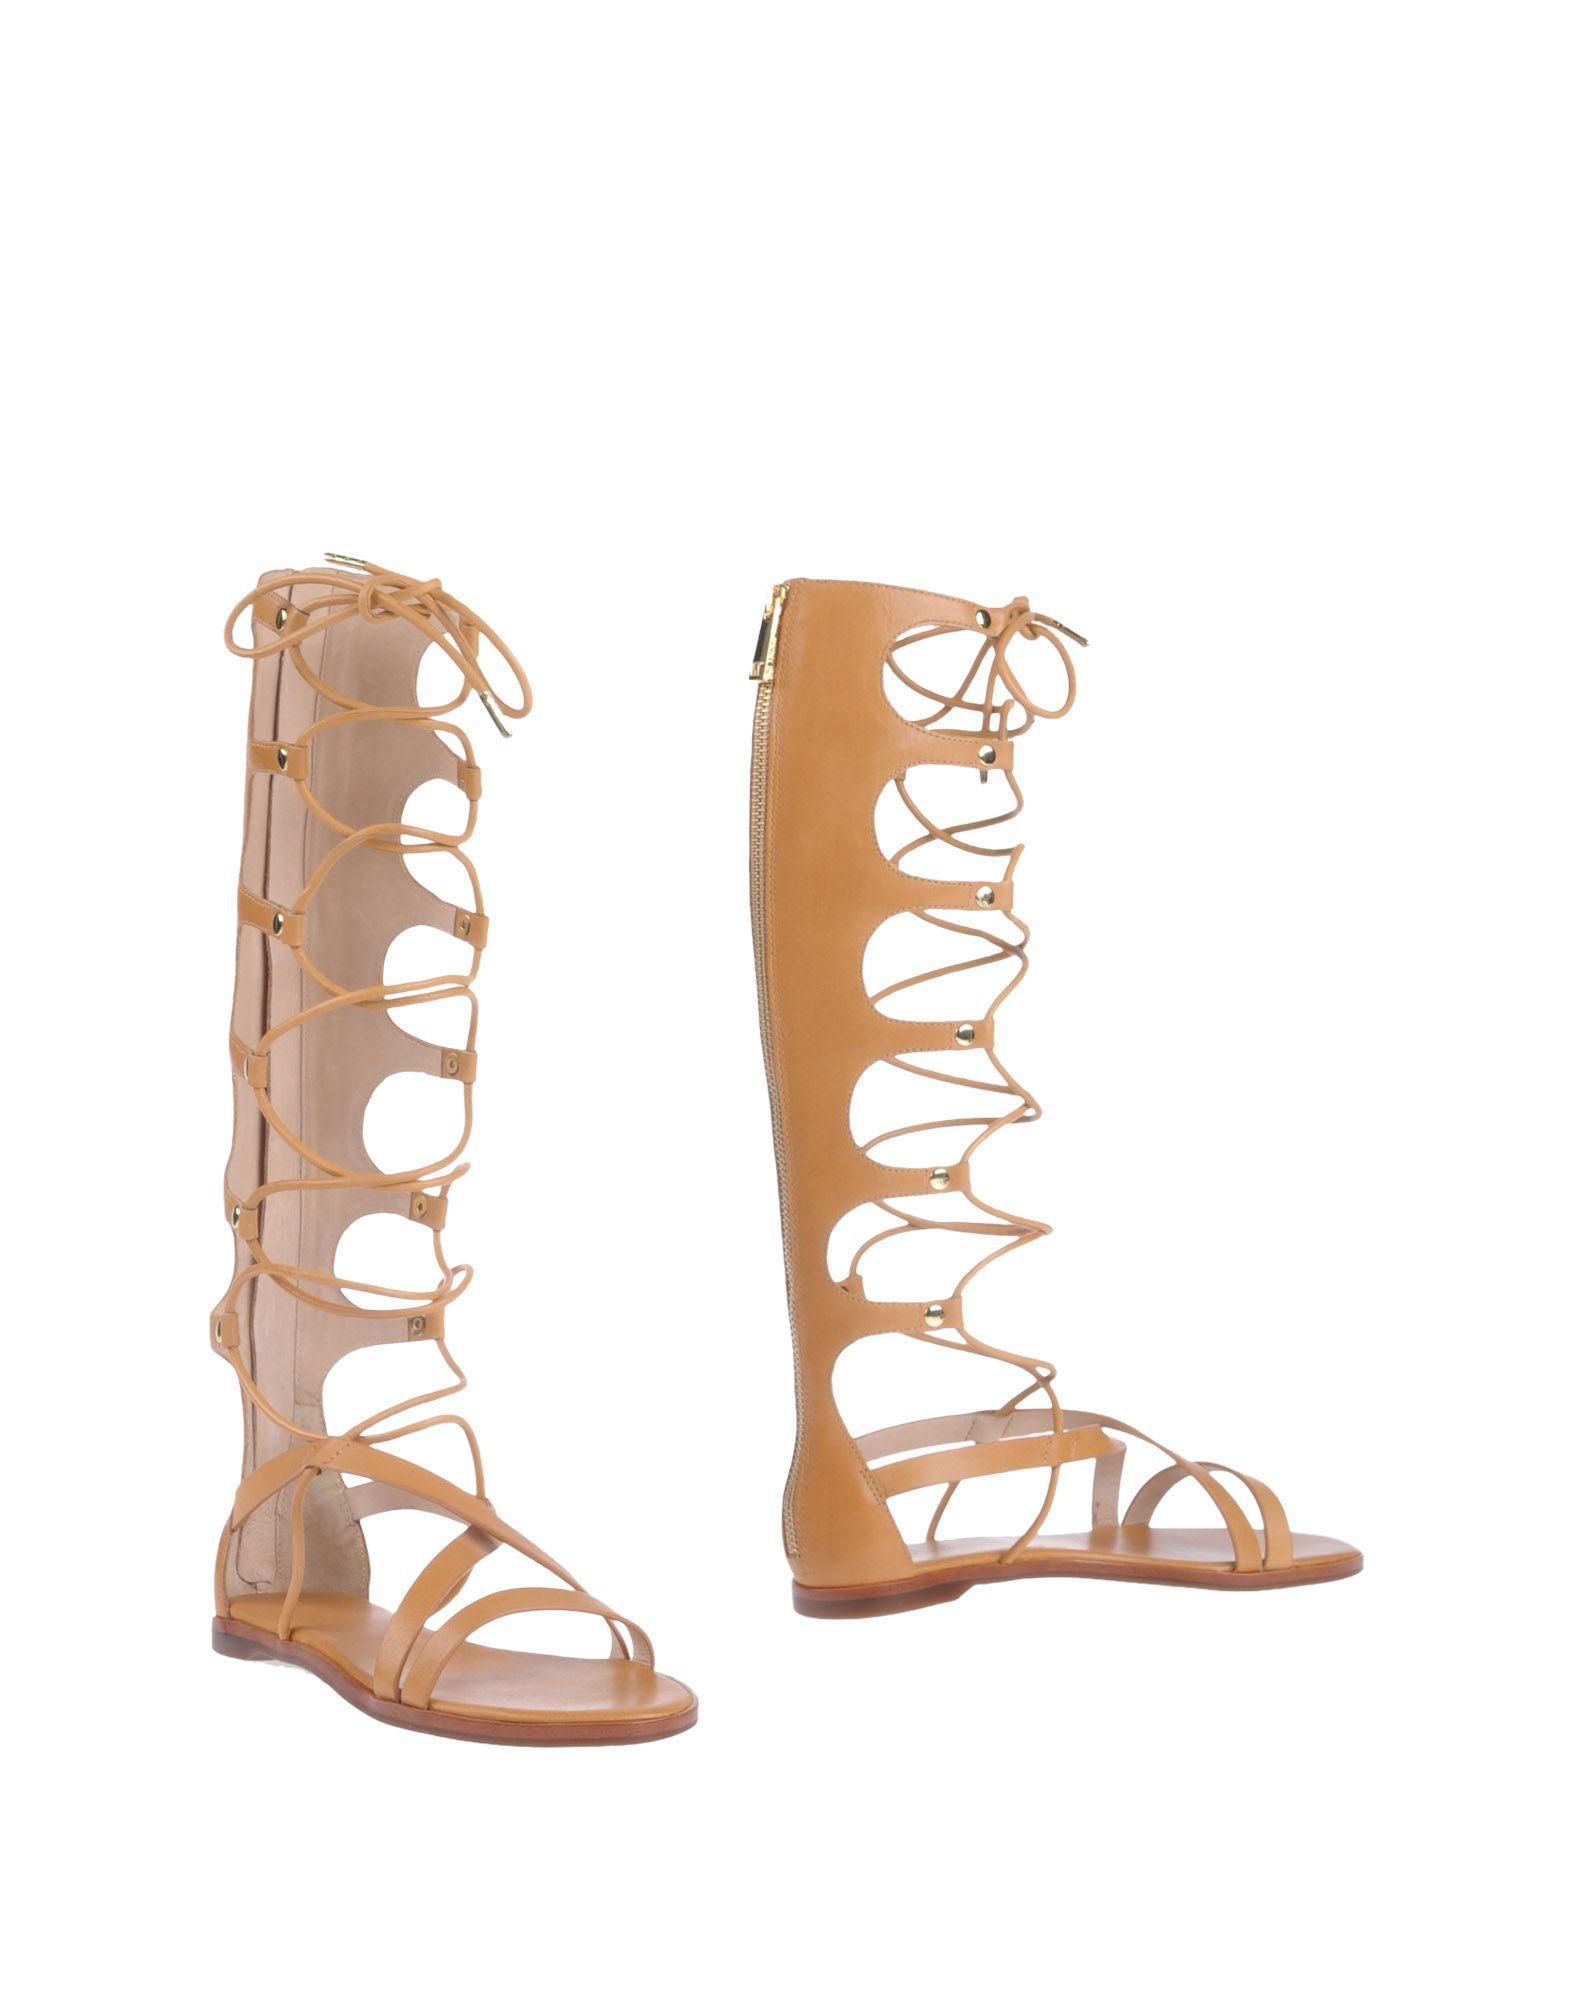 Rachel Zoe Sandalen Damen Beliebte  11112261HP Beliebte Damen Schuhe 6e1647